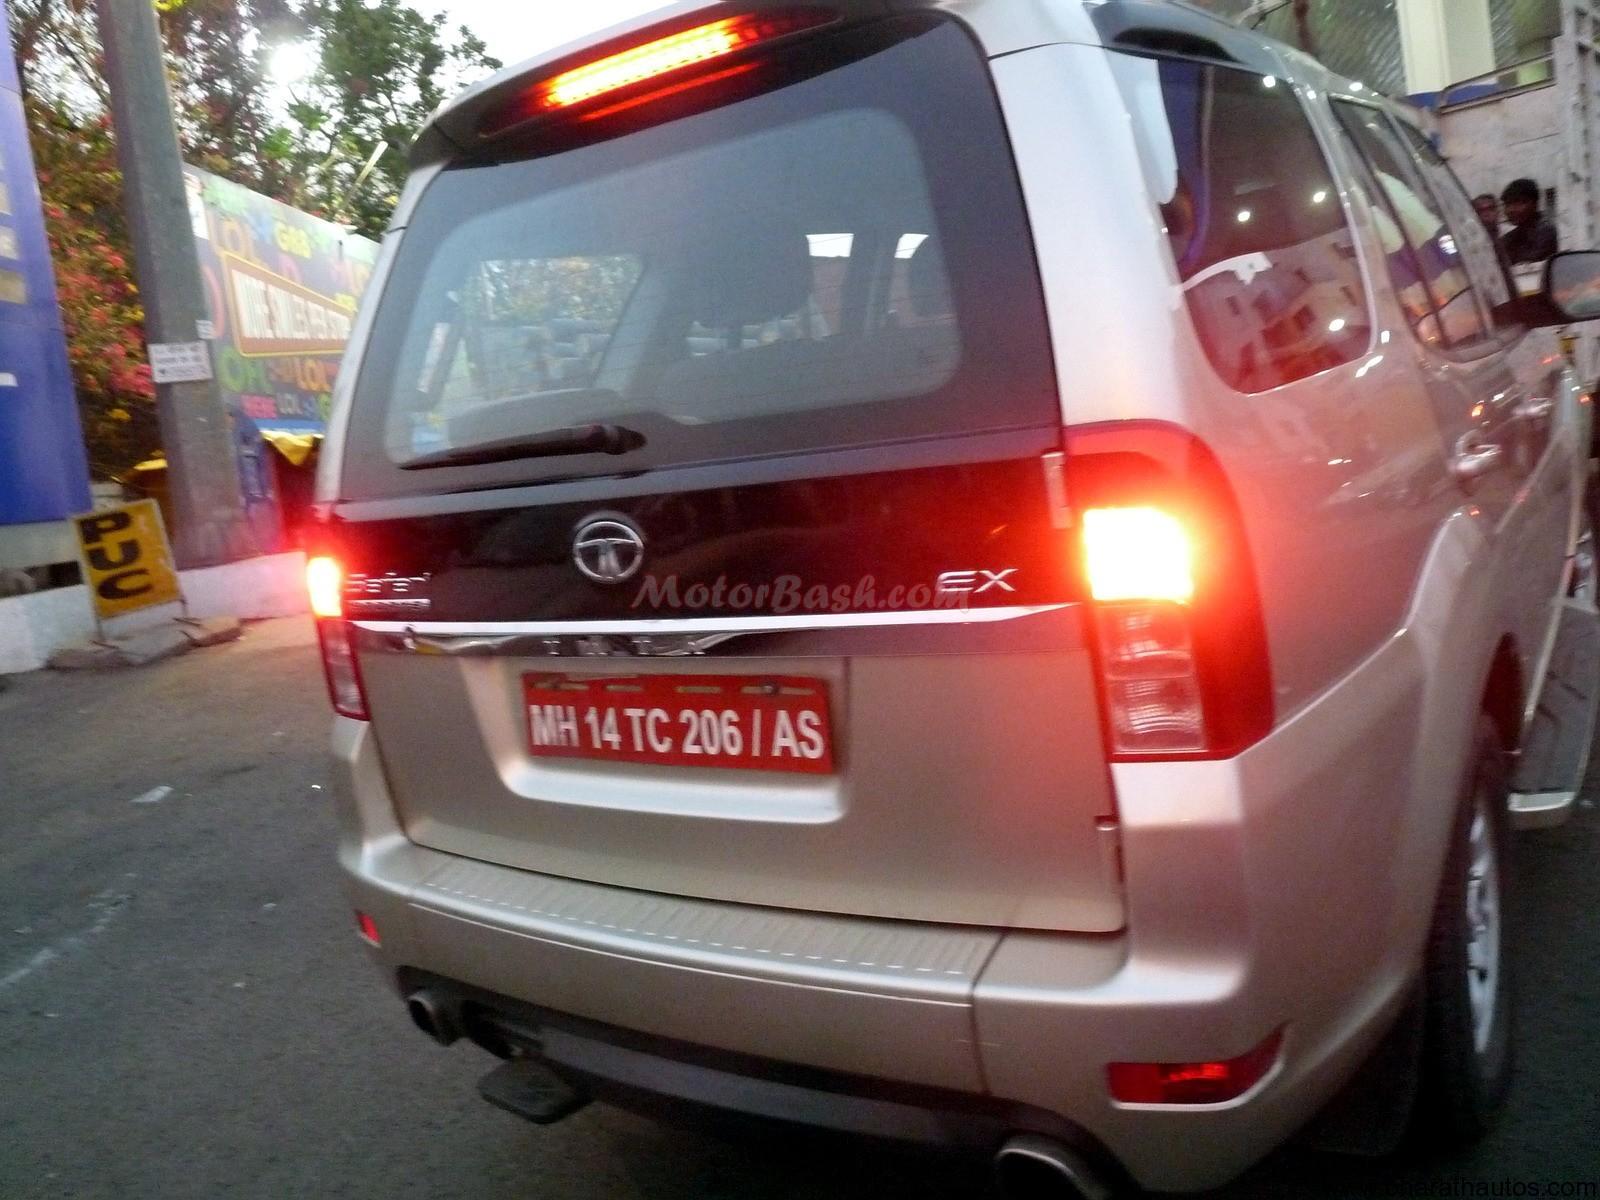 See more spied pictures of Metallic Golden Tata Safari Strome SUV -